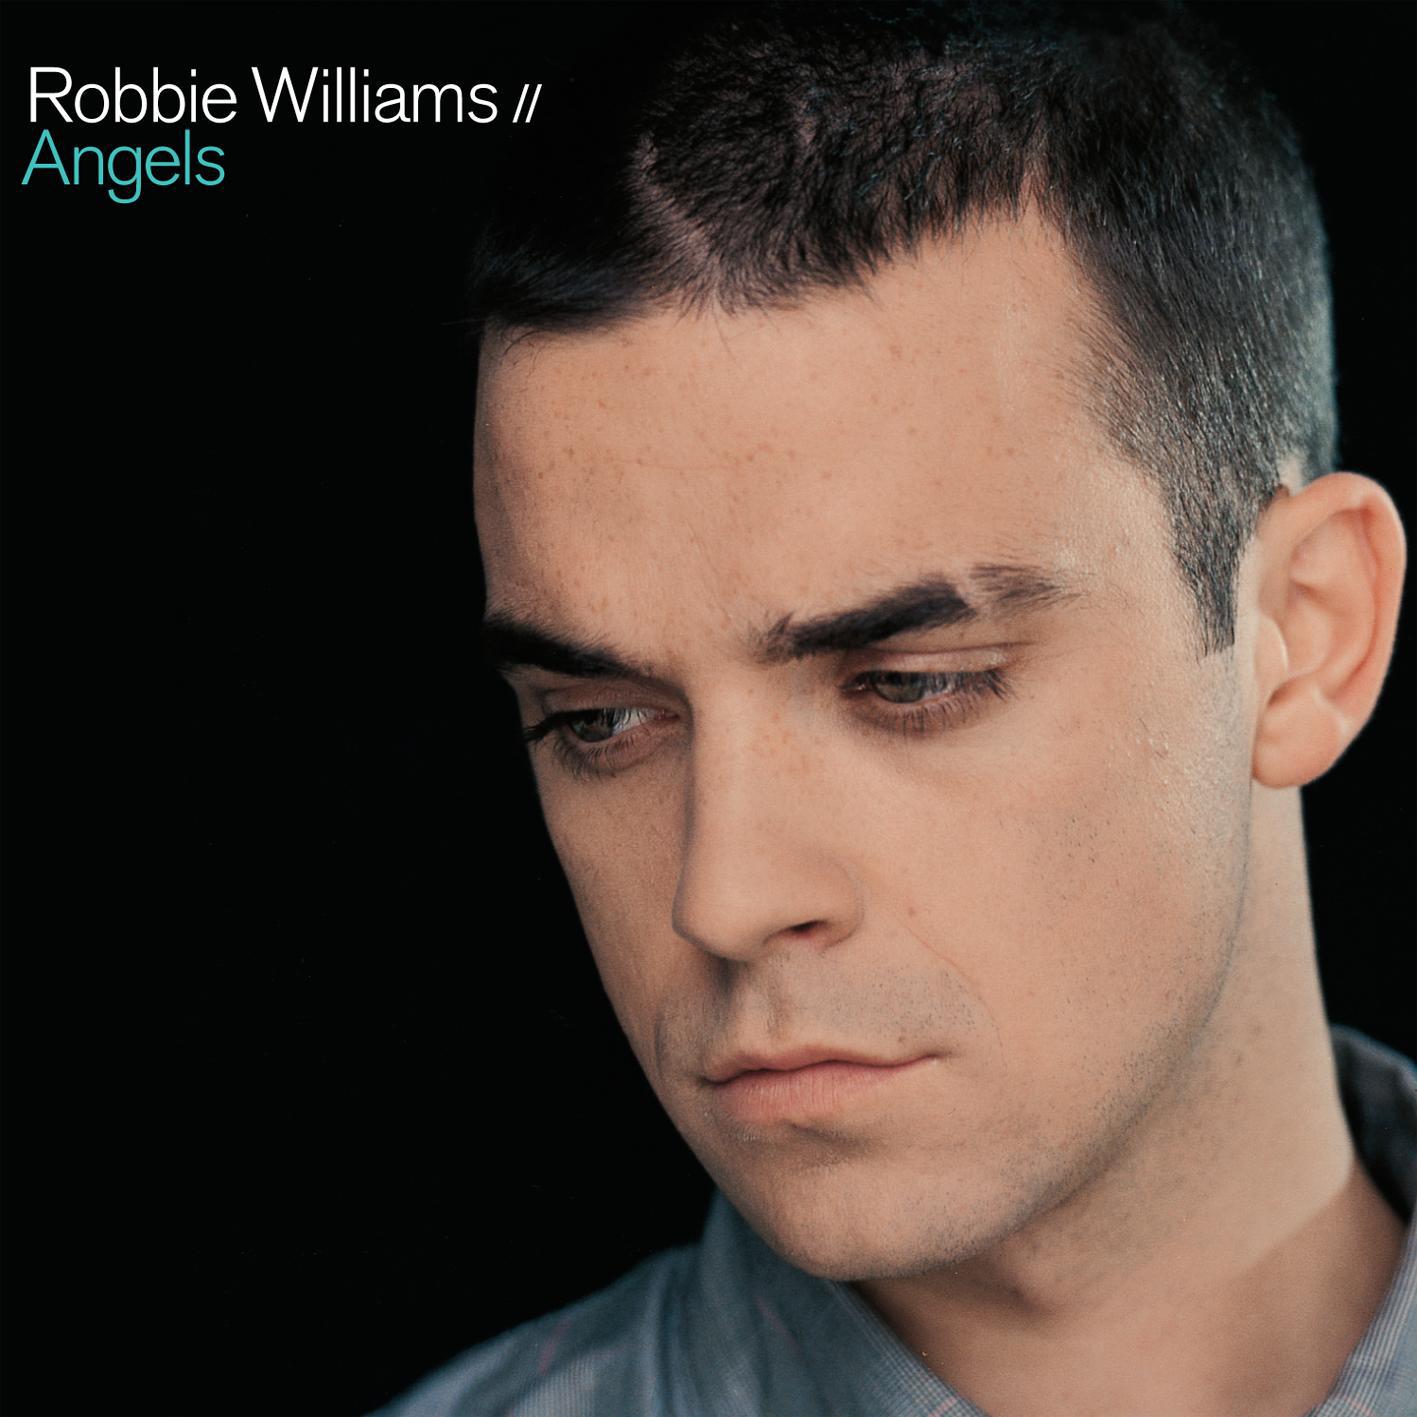 robbie-williams-angles.jpg